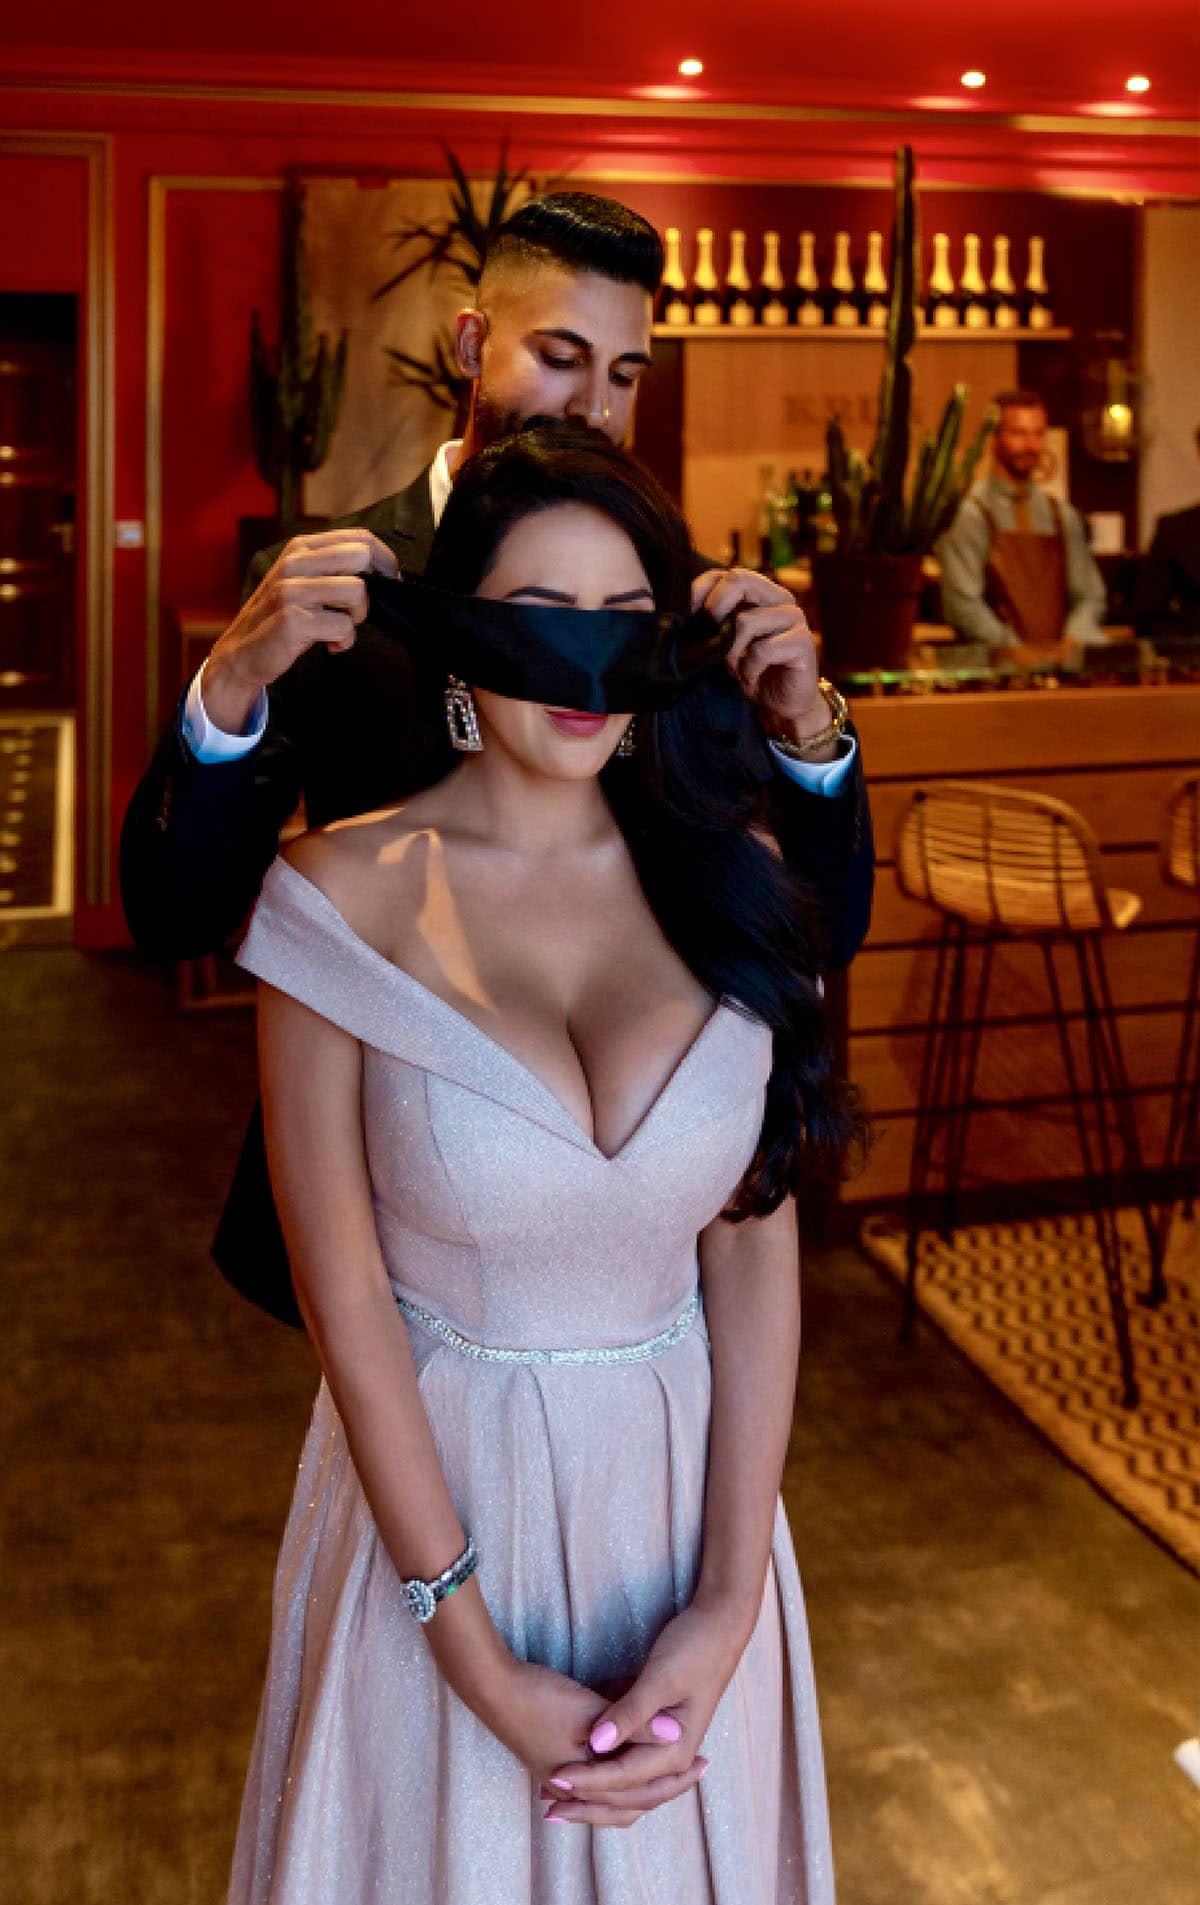 Dhar Mann surprise proposal to Laura G